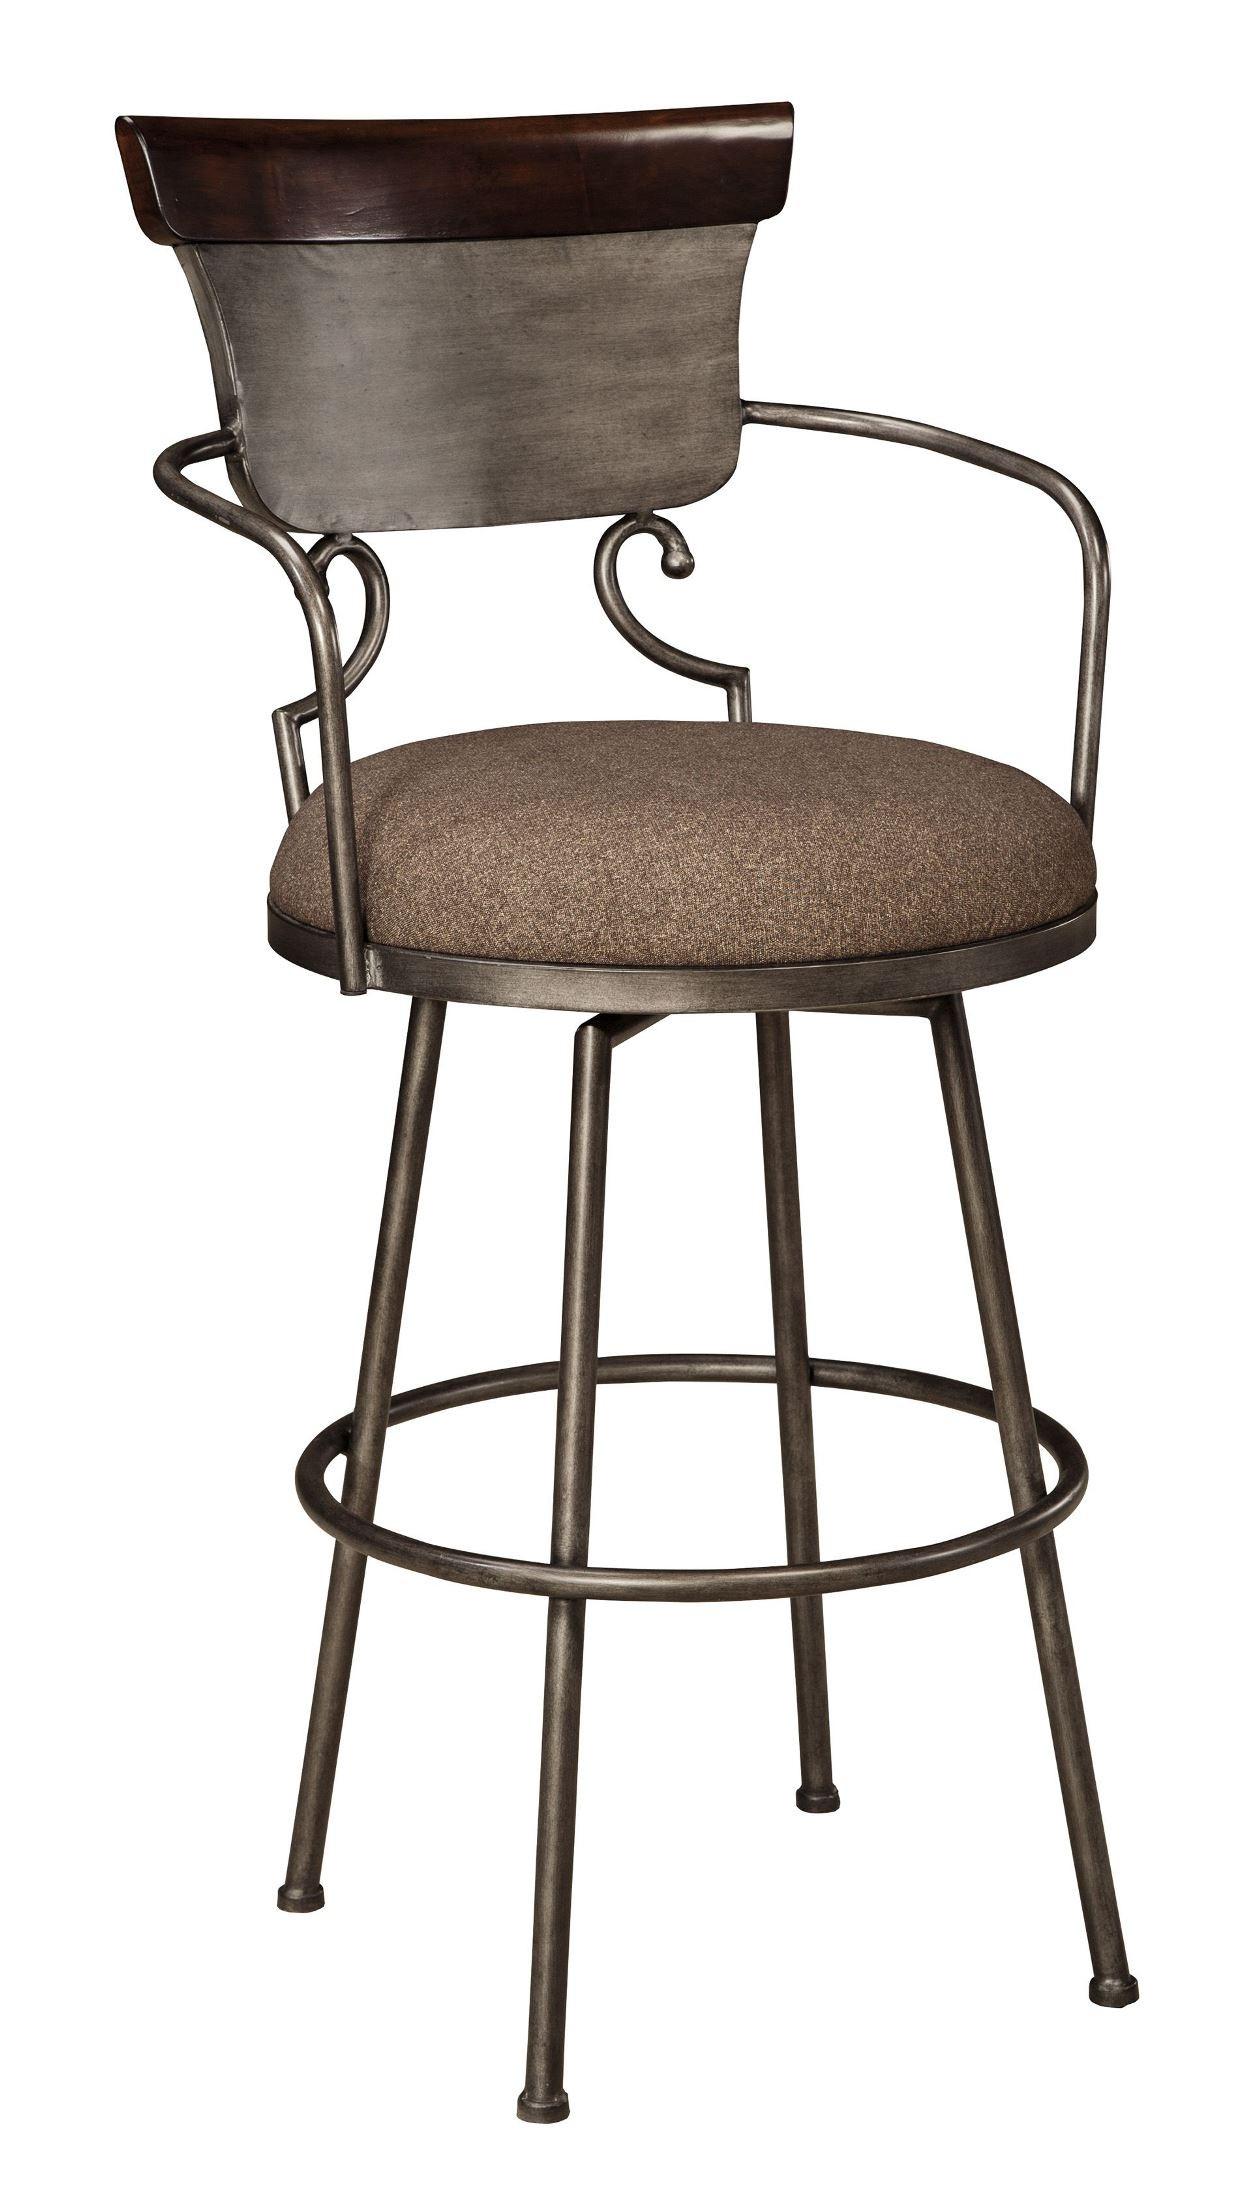 Moriann Tall Upholstered Barstool From Ashley D608 630 Coleman Furniture